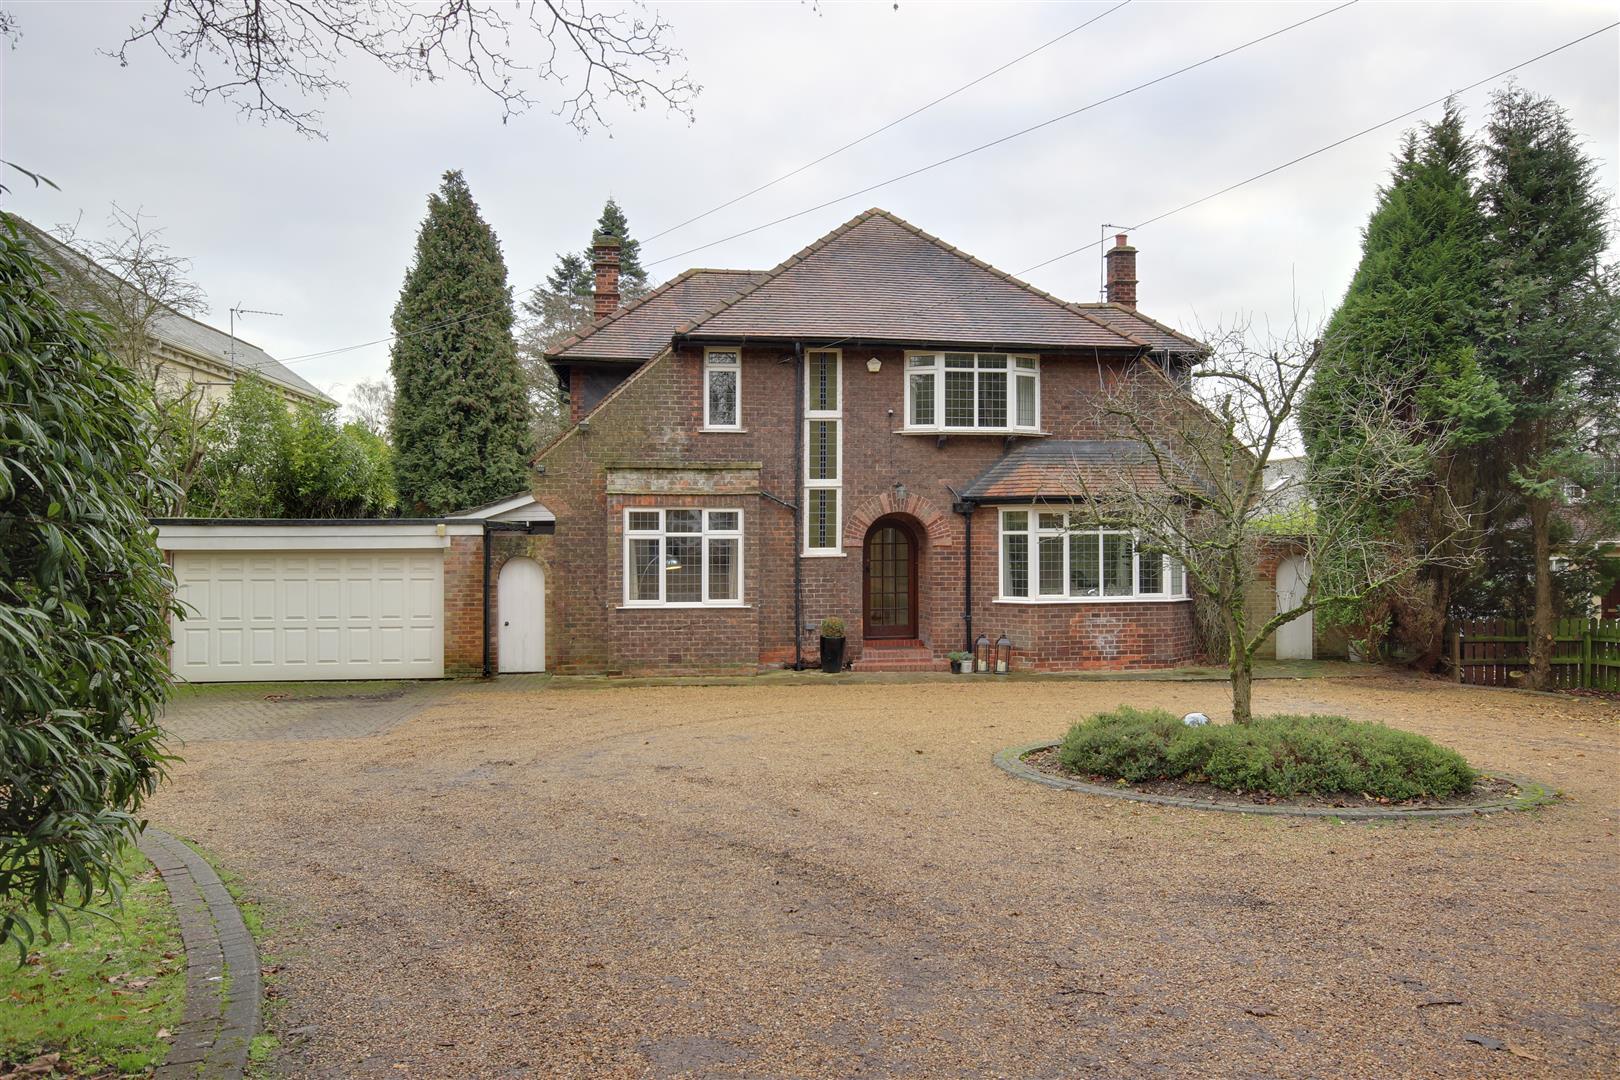 Brentwood Kemp Road, Swanland, North Ferriby, Brentwood, HU14 3LZ